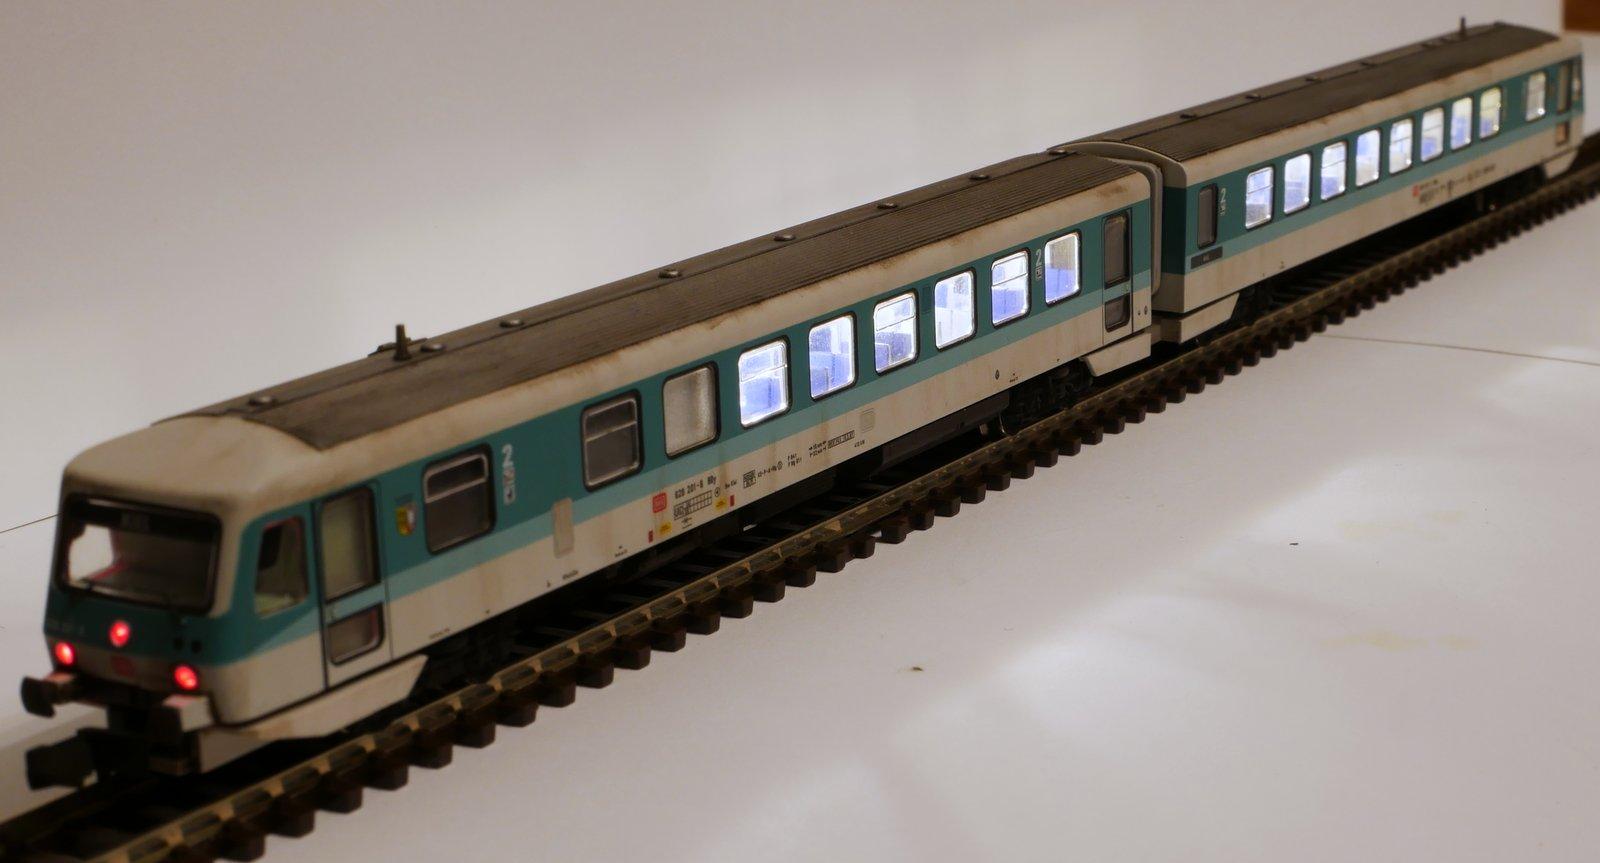 P1140775-001.JPG